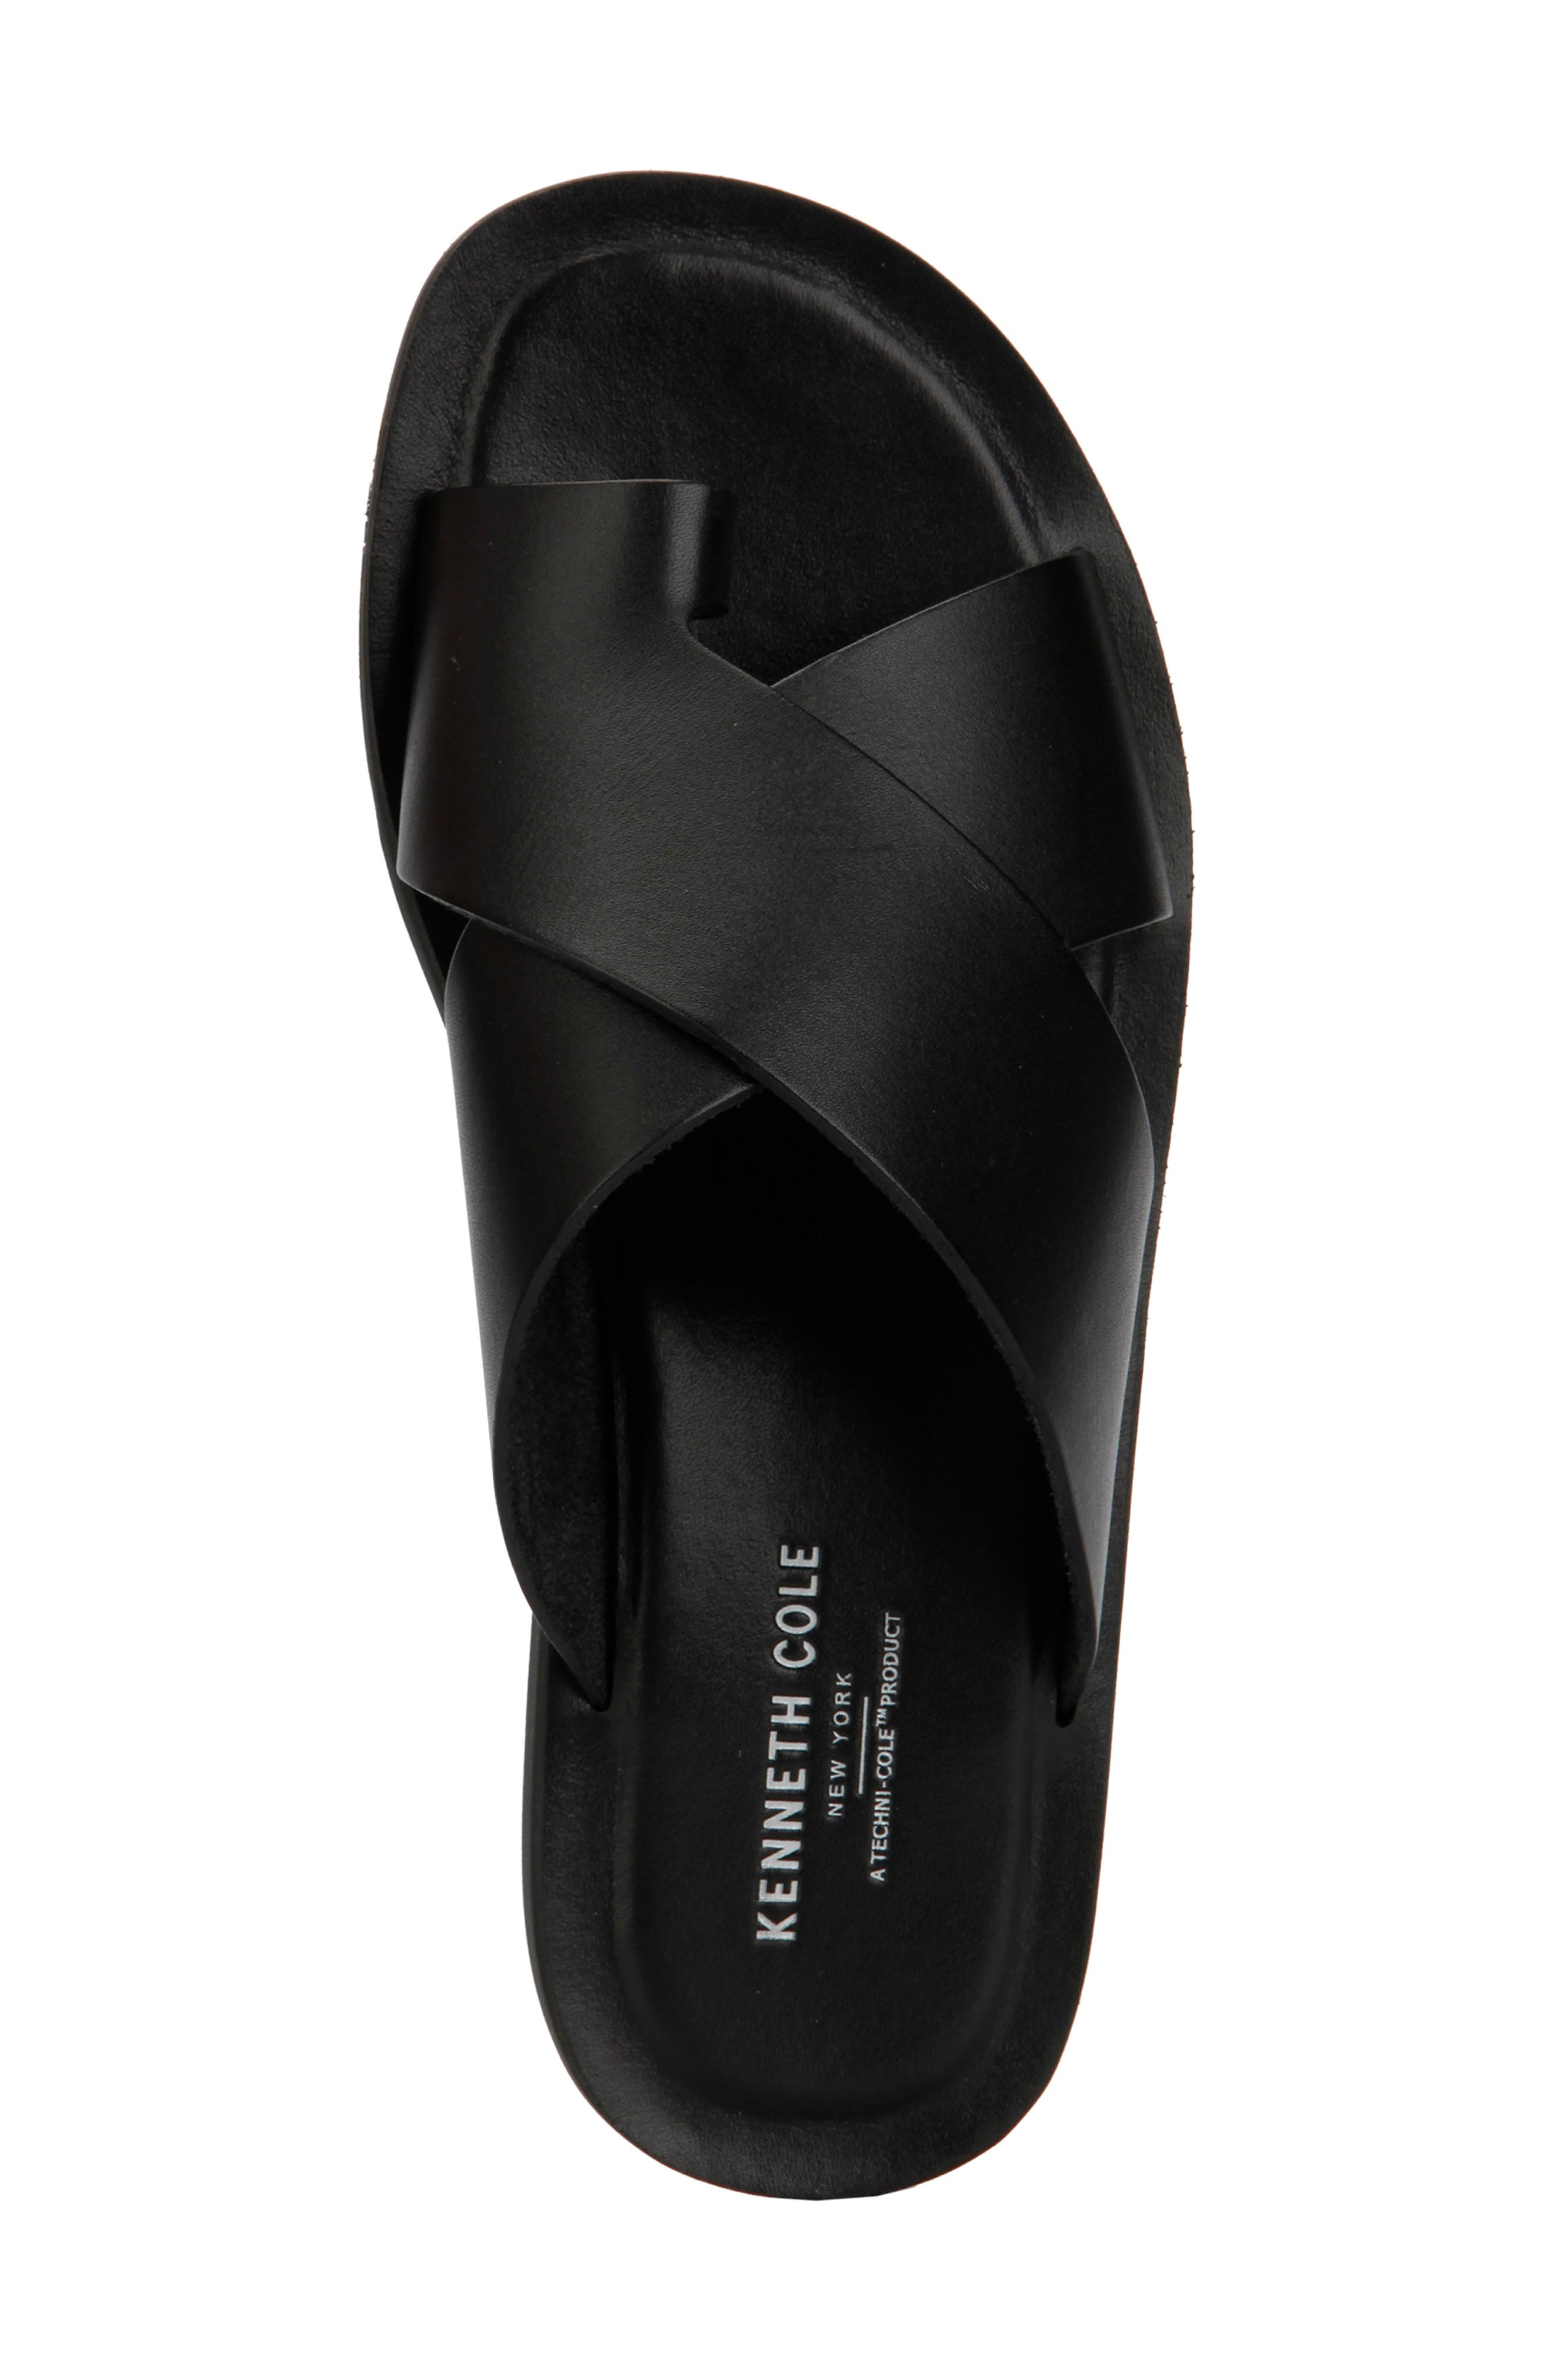 KENNETH COLE NEW YORK, Ideal Slide Sandal, Alternate thumbnail 3, color, BLACK LEATHER